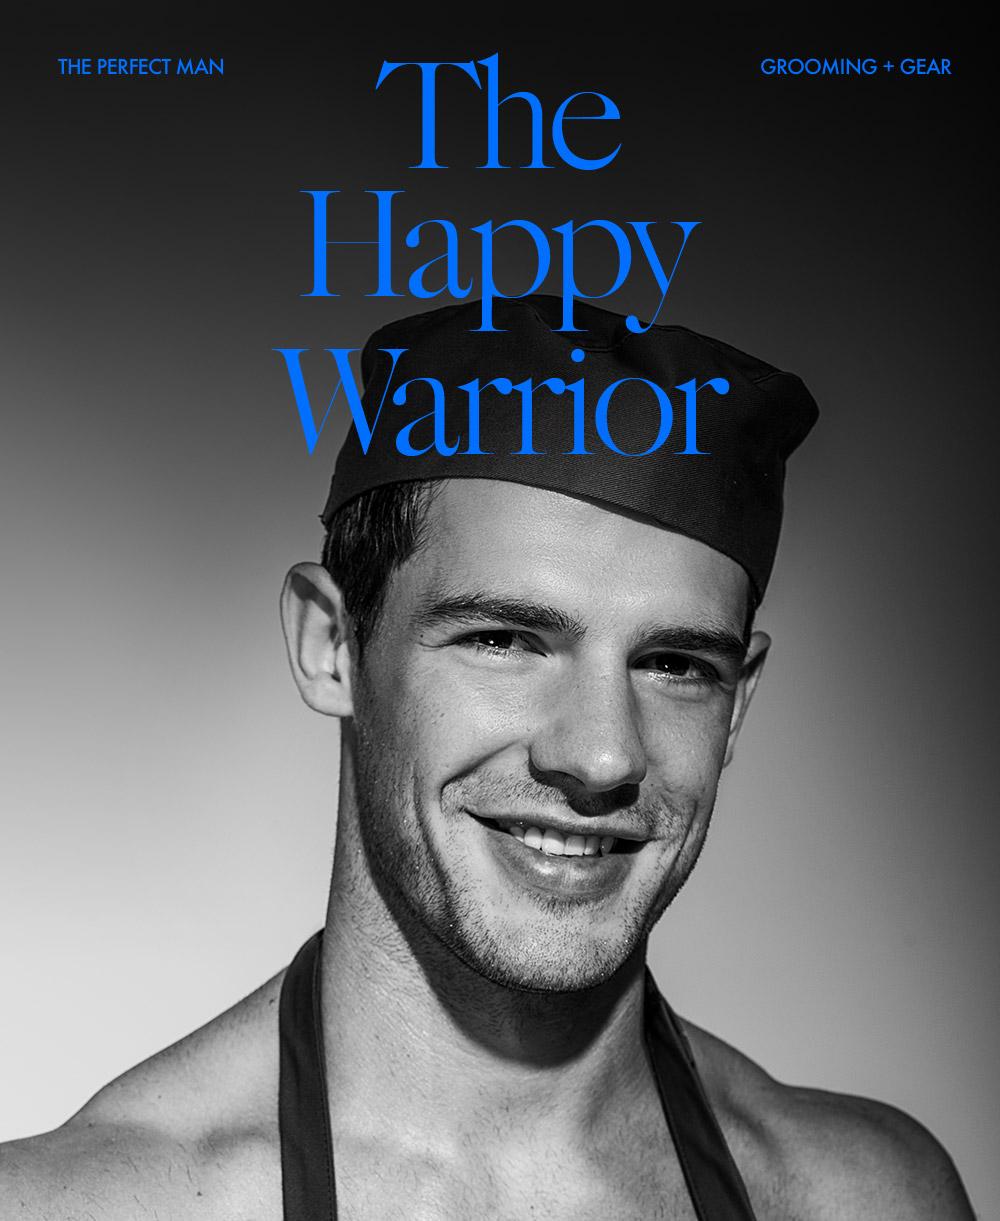 TheHappyWarrior02.jpg